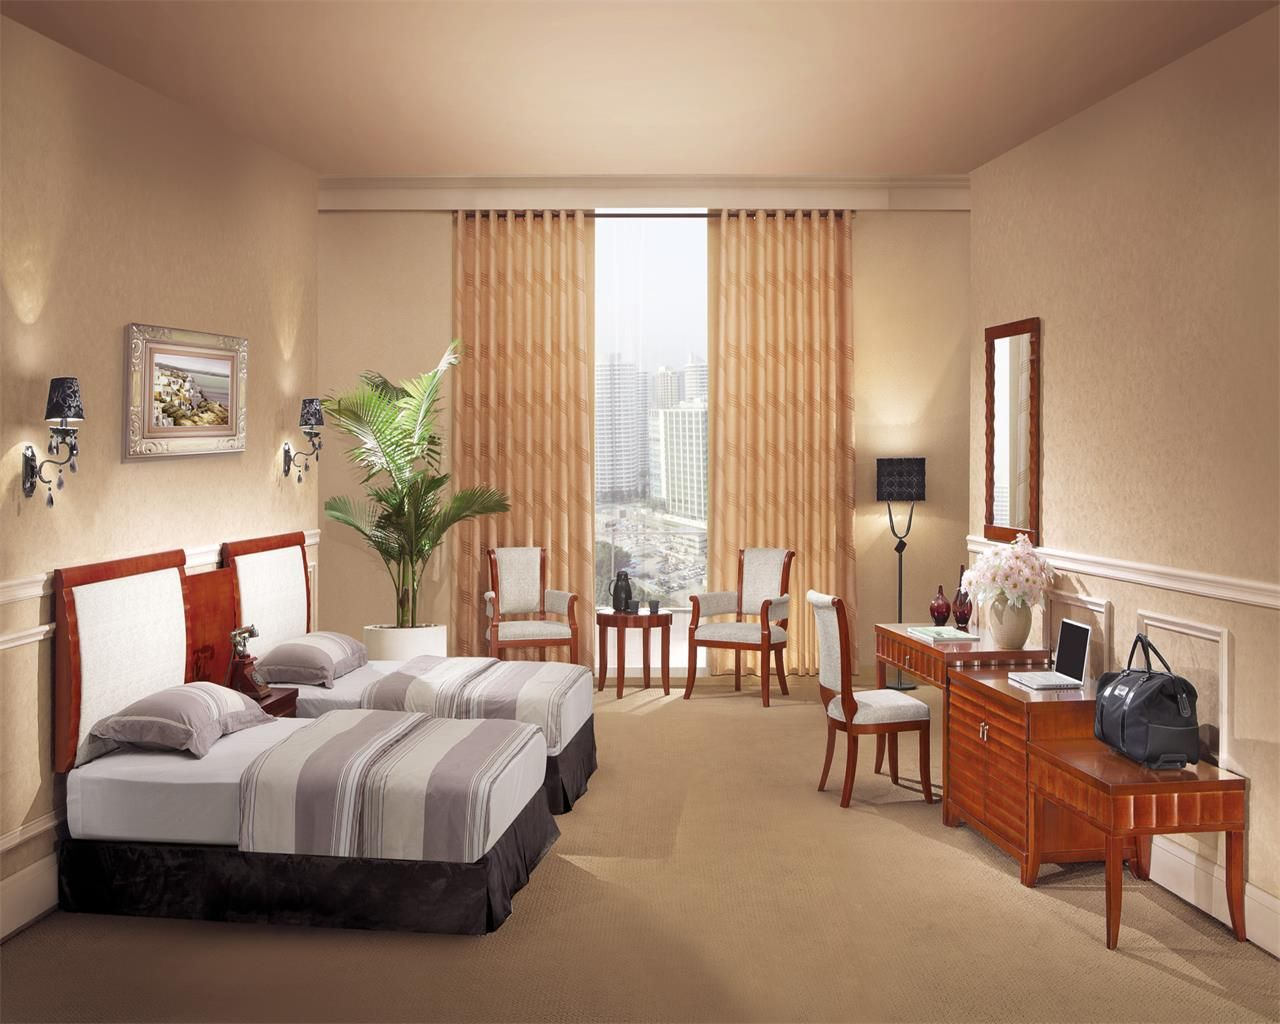 pin by hongkong trulene enterprise development limited on hotel